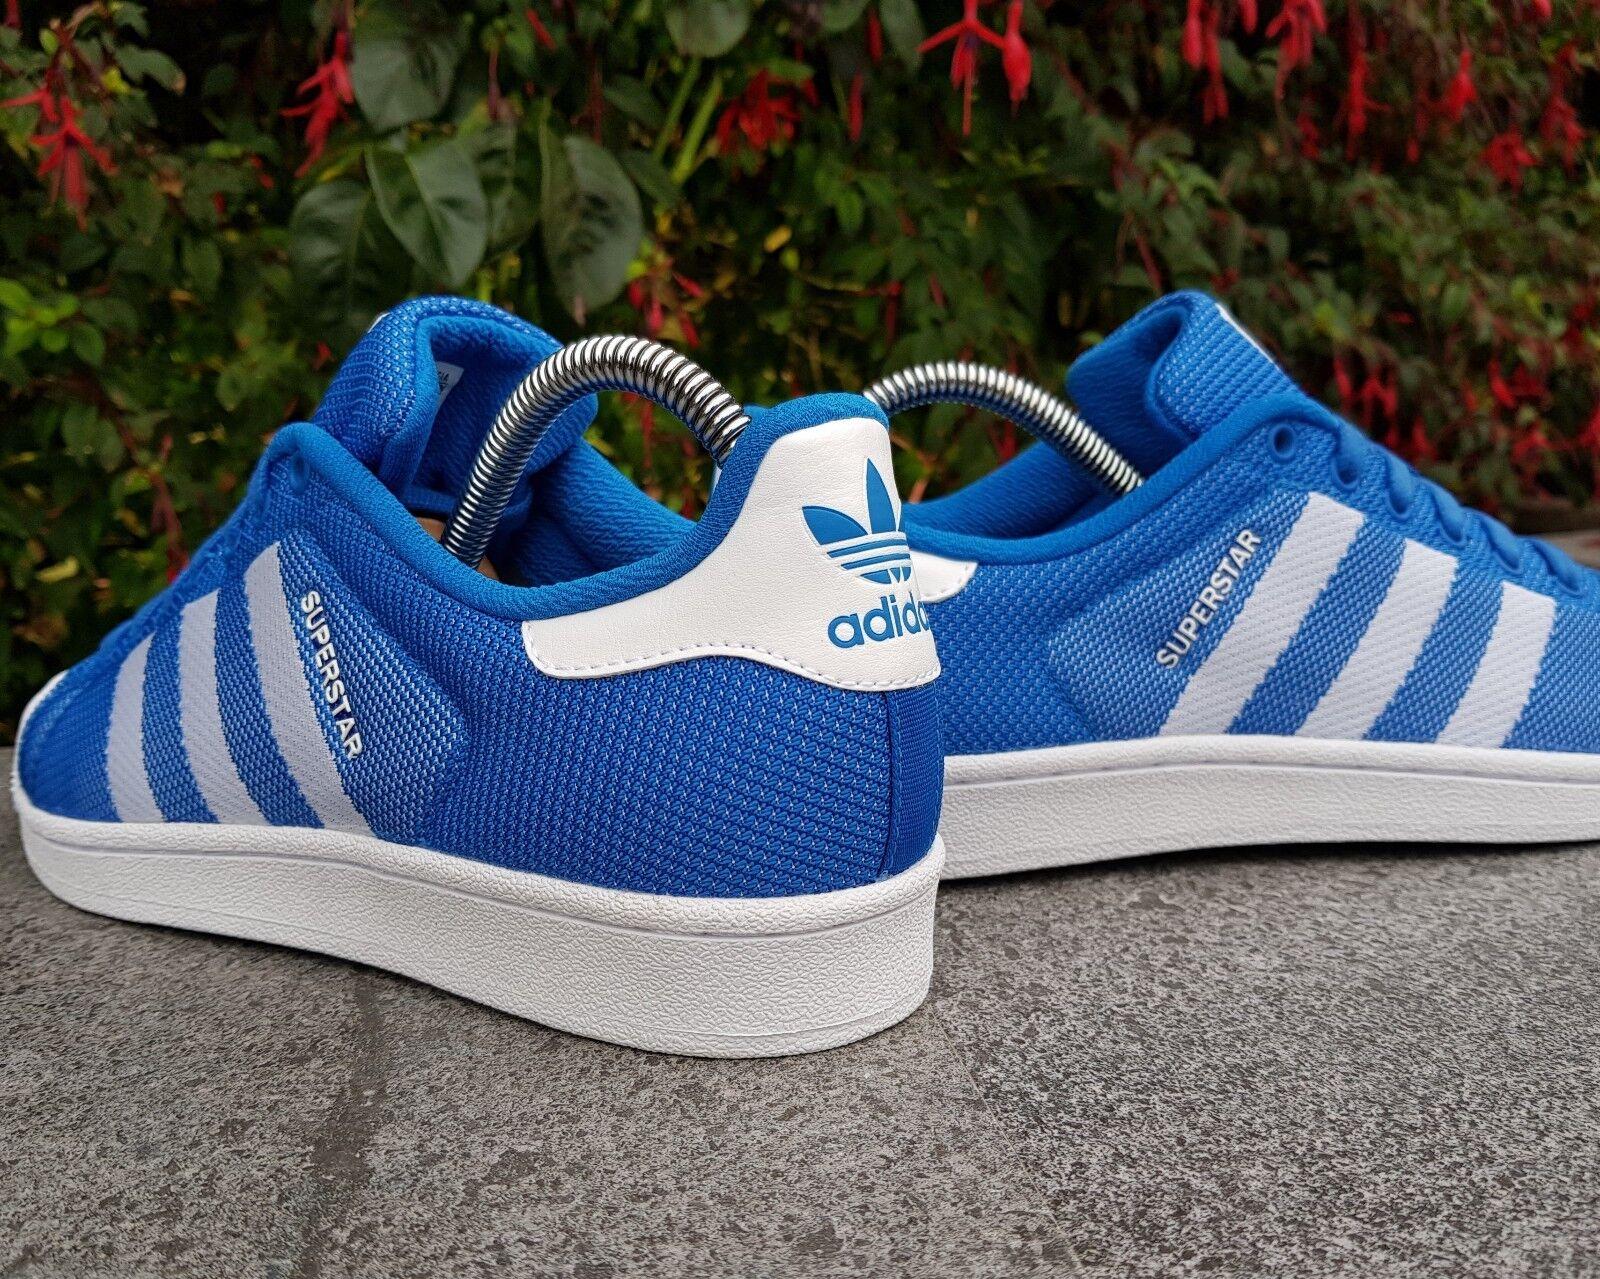 BNWB & Genuine adidas originals ® Superstar blueebird White Trainers UK Size 7.5